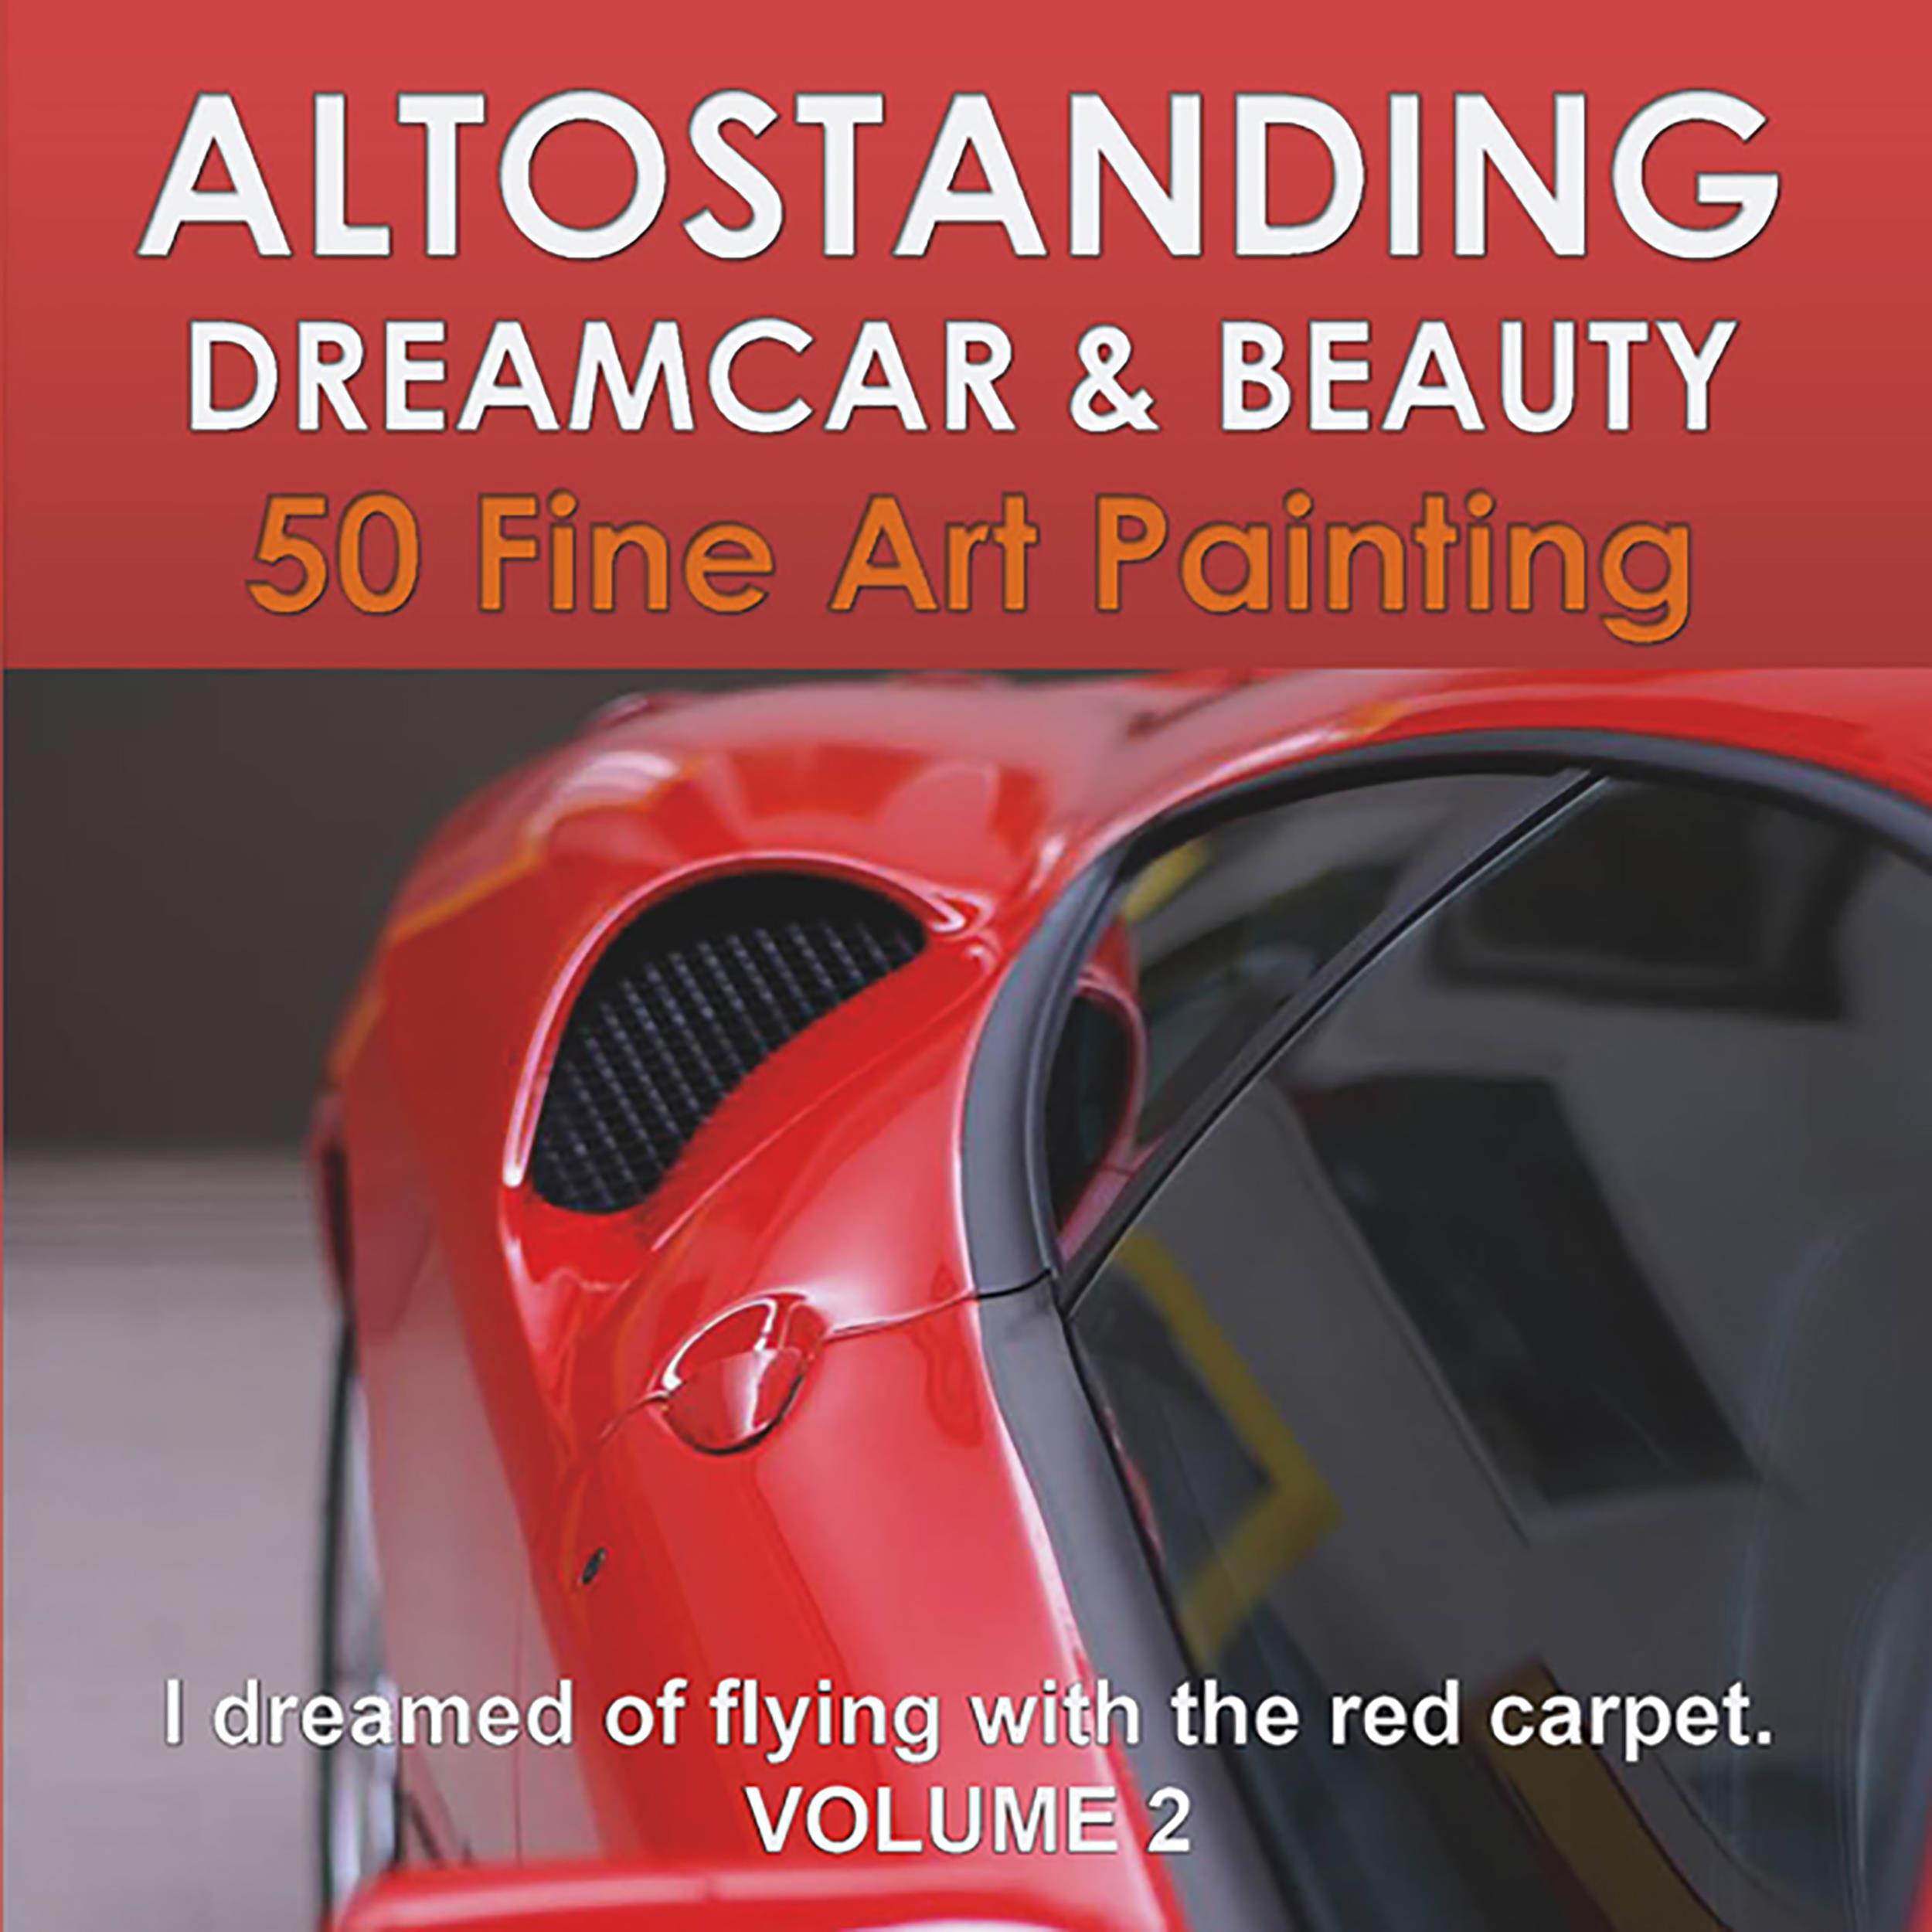 Altostanding - Dream Car & Beauty. 50 fine art printing. Volume 2